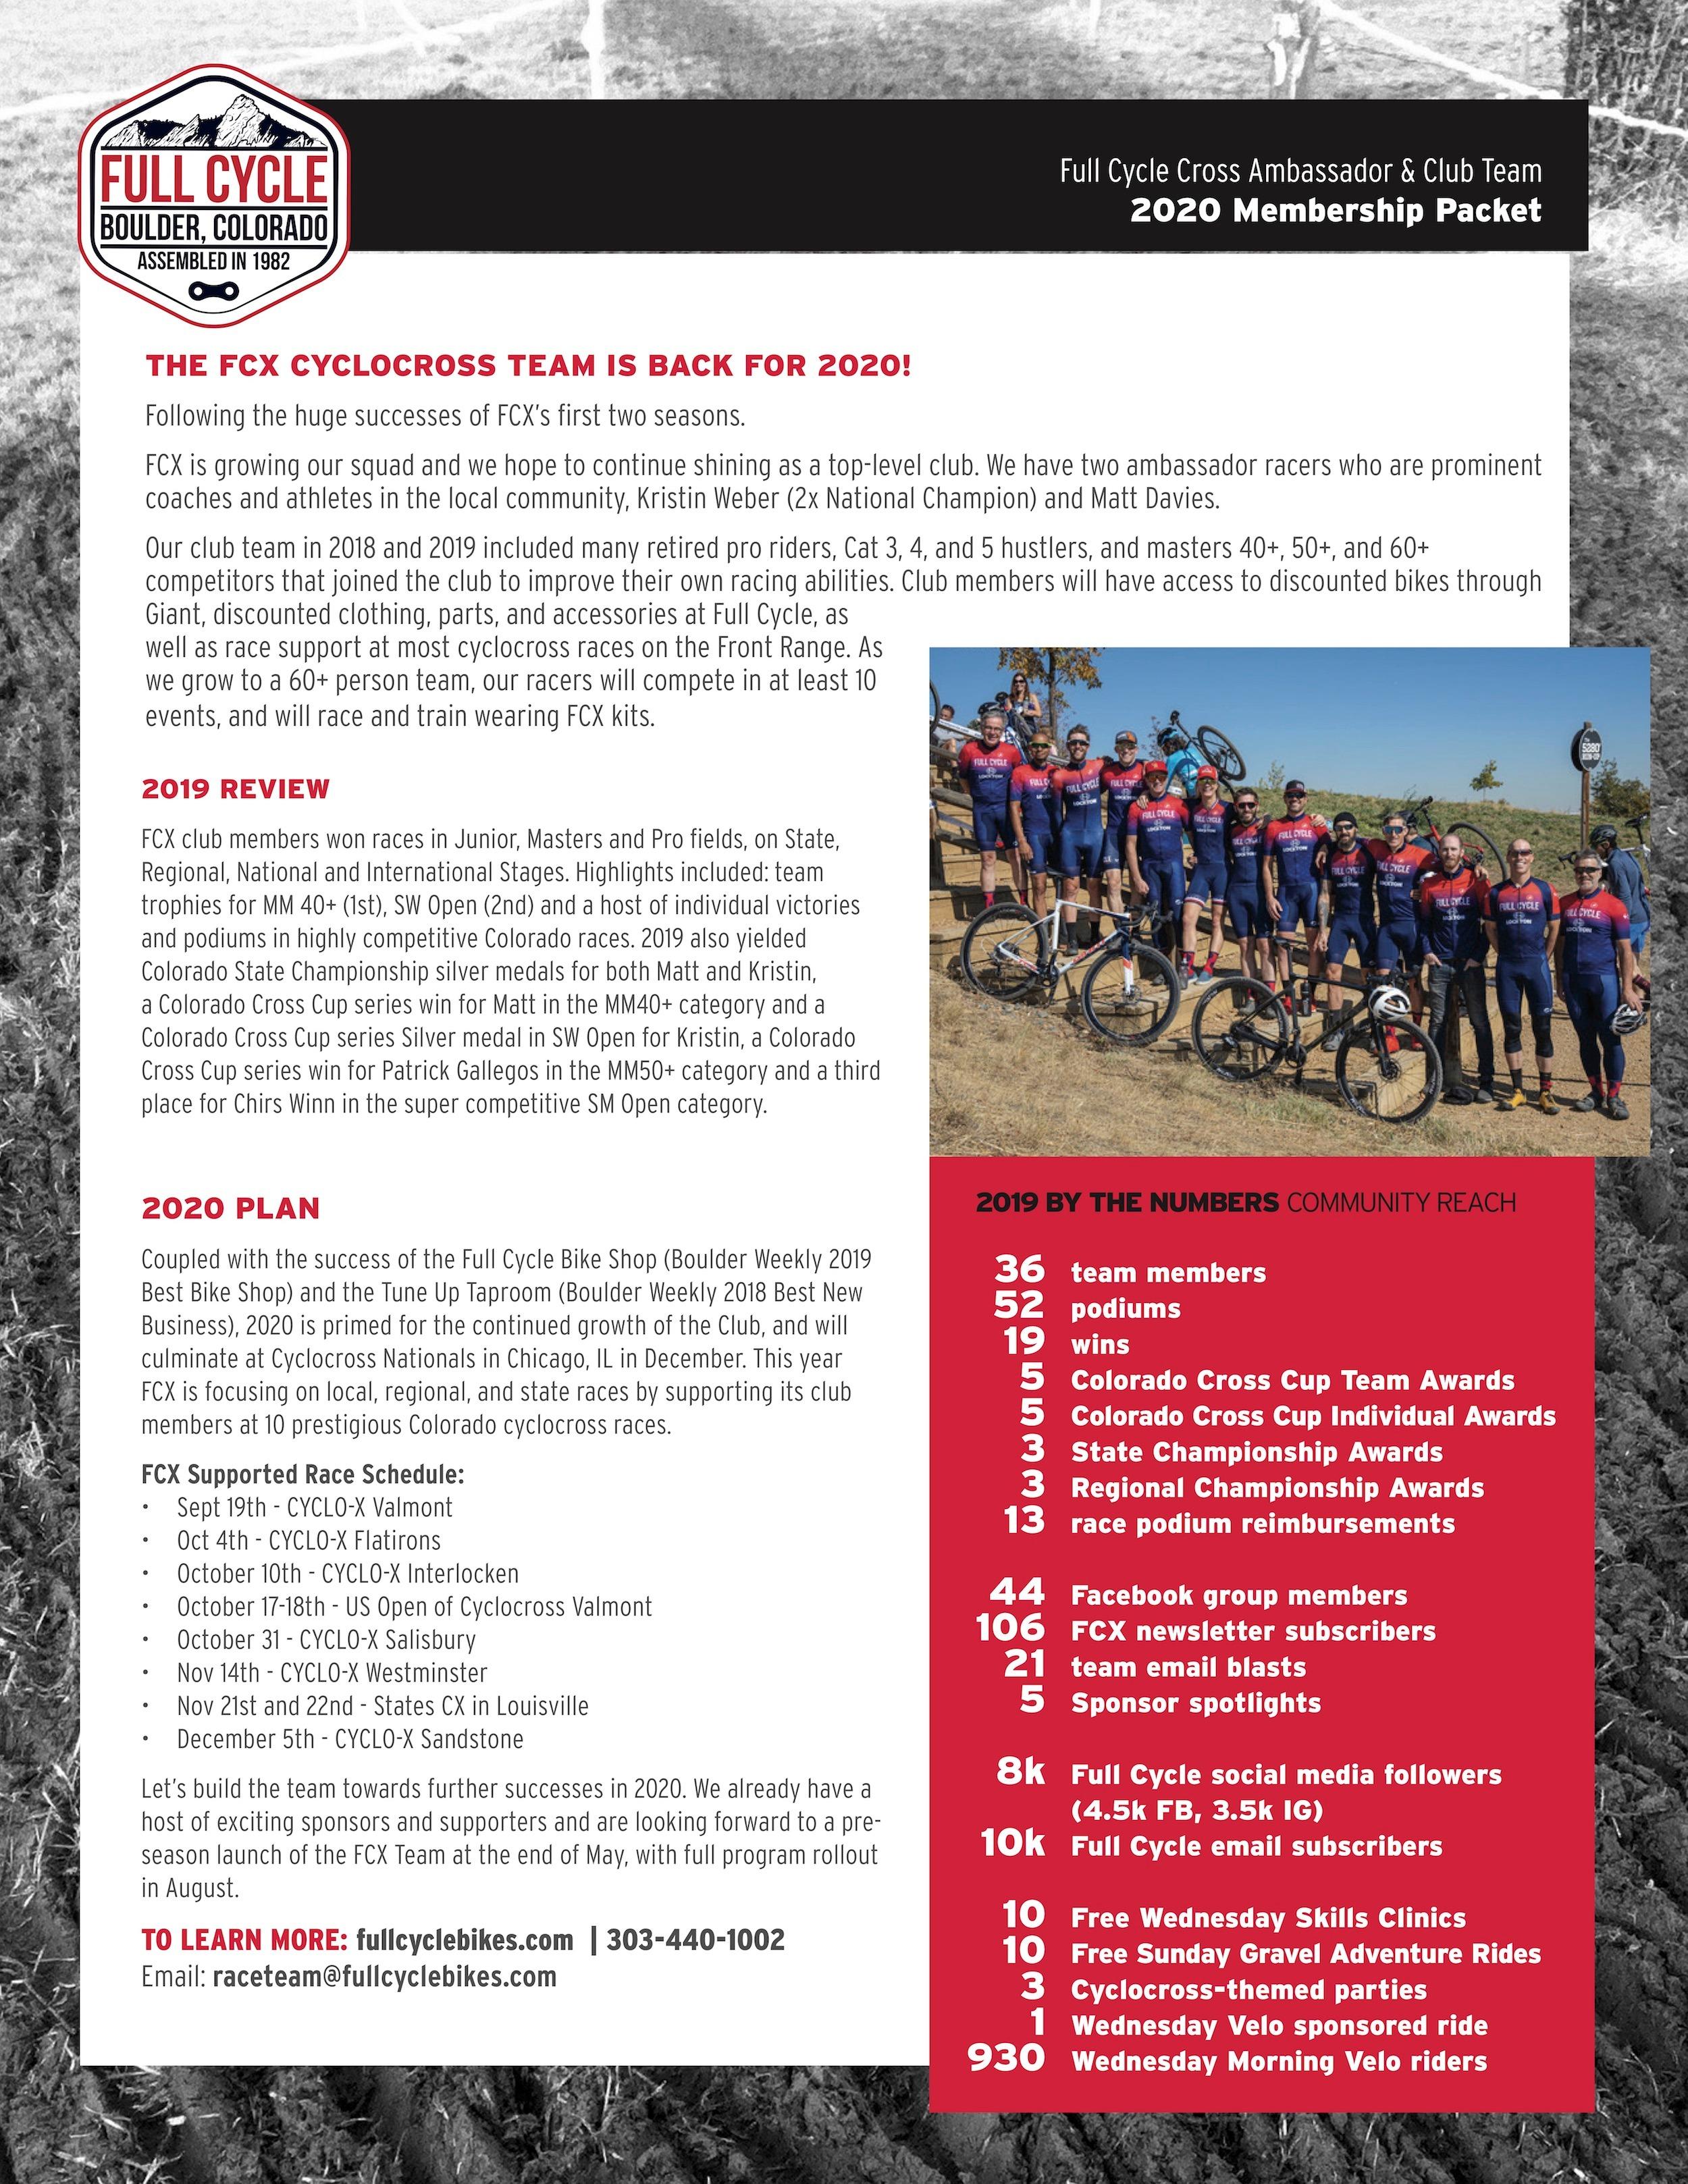 full cycle cyclocross team membership